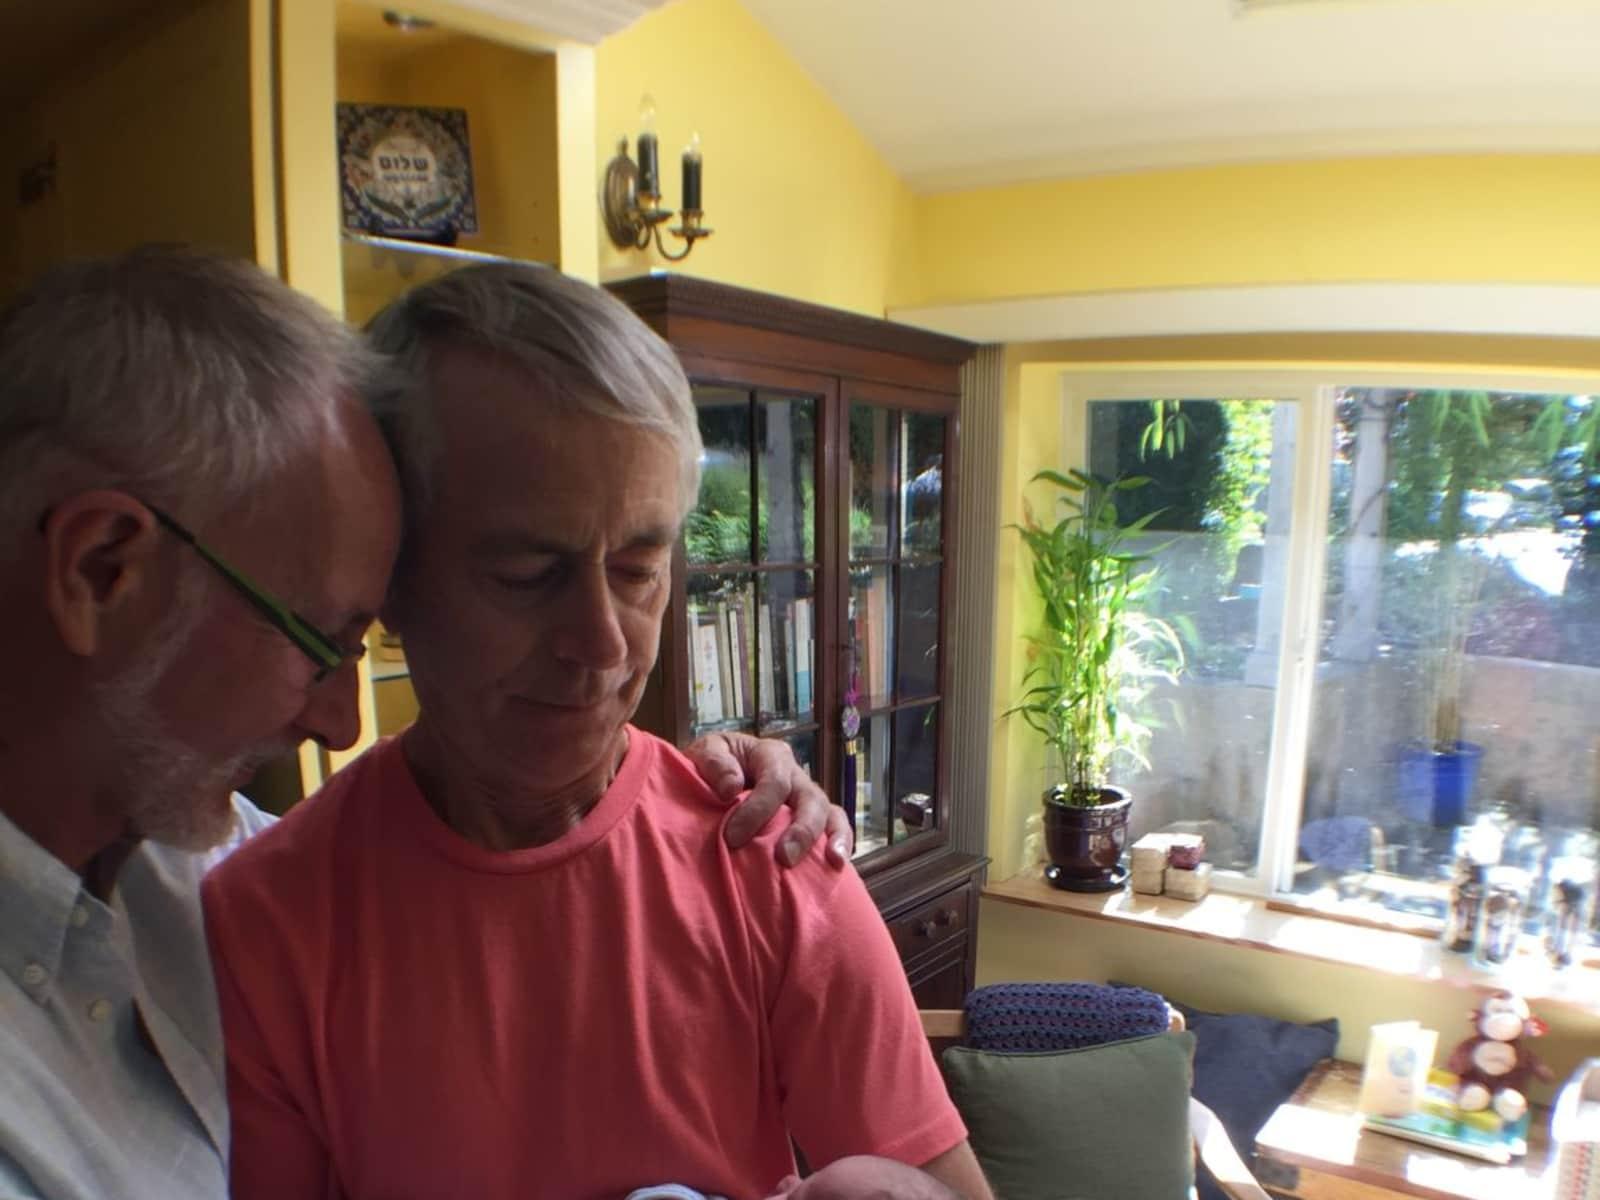 John & Robert from Victoria, British Columbia, Canada